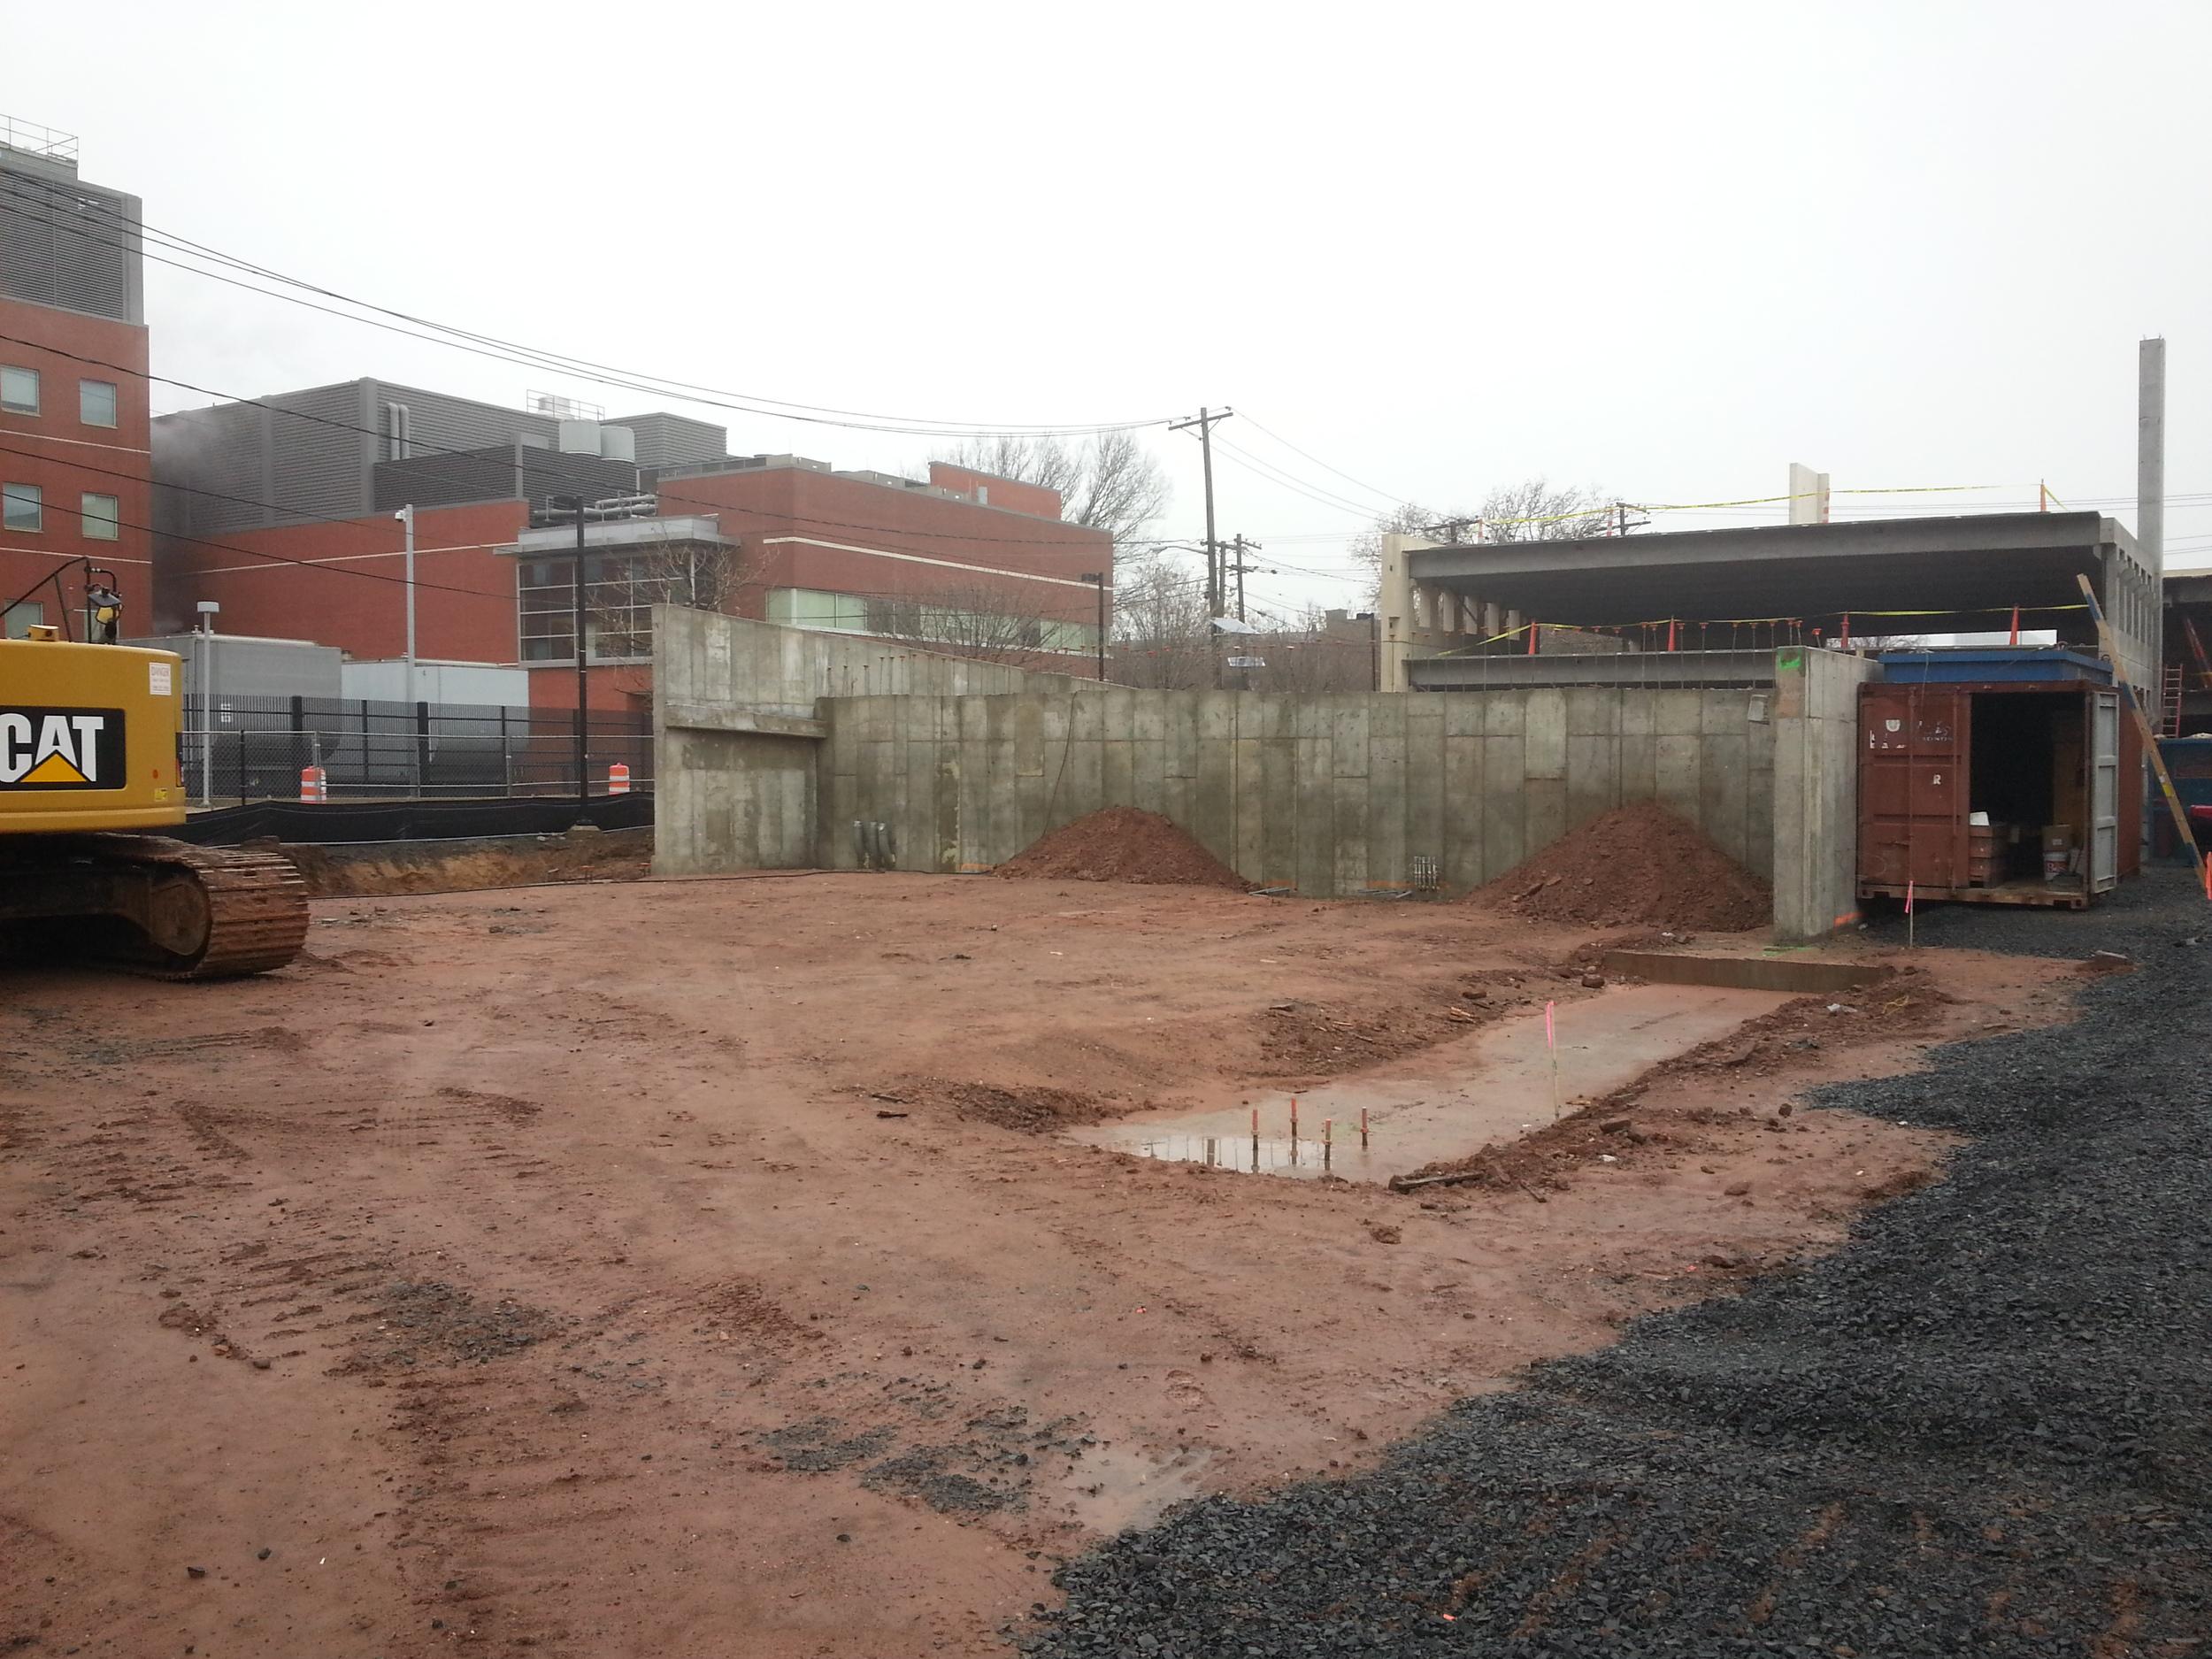 New Jersey Institute of Technology Parking Garage - Newark, NJ